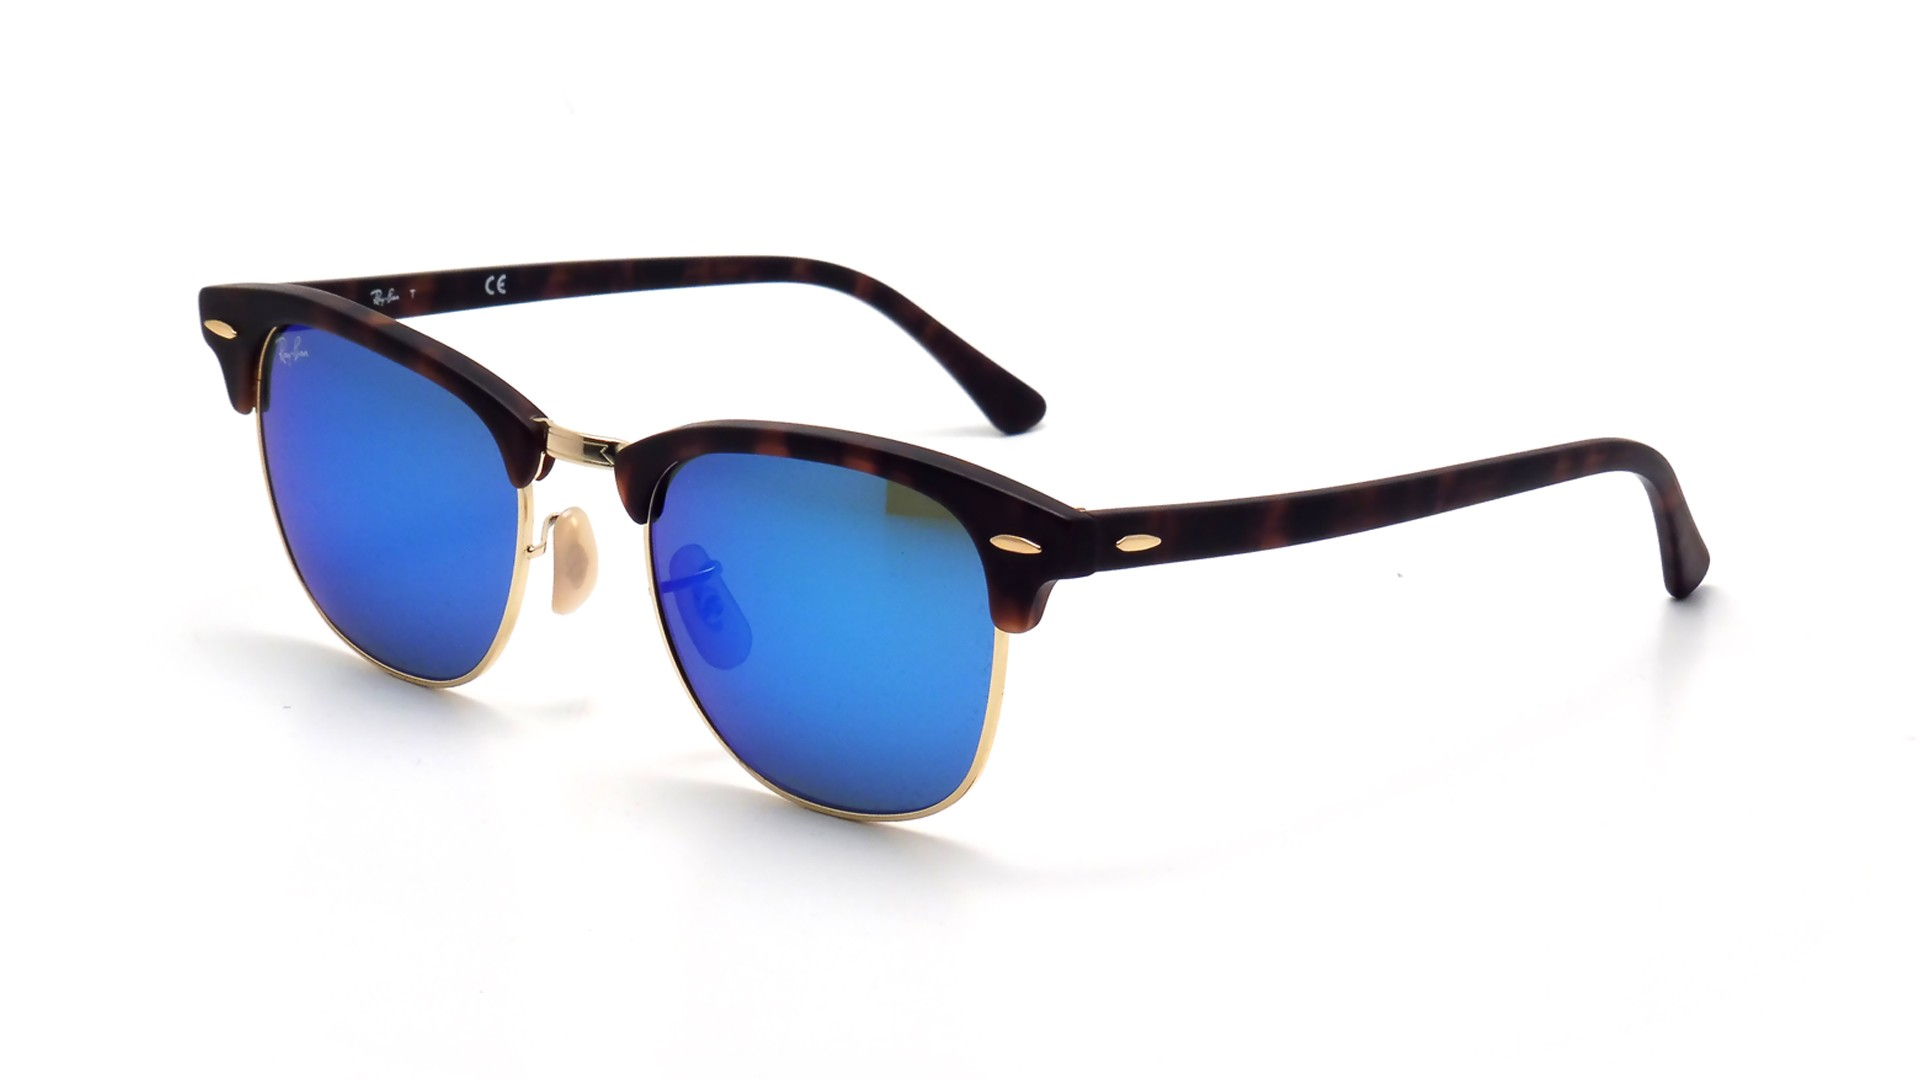 e6306e7d8 ... spain sunglasses ray ban clubmaster tortoise flash lenses rb3016 1145  17 51 21 medium 16246 c4d06